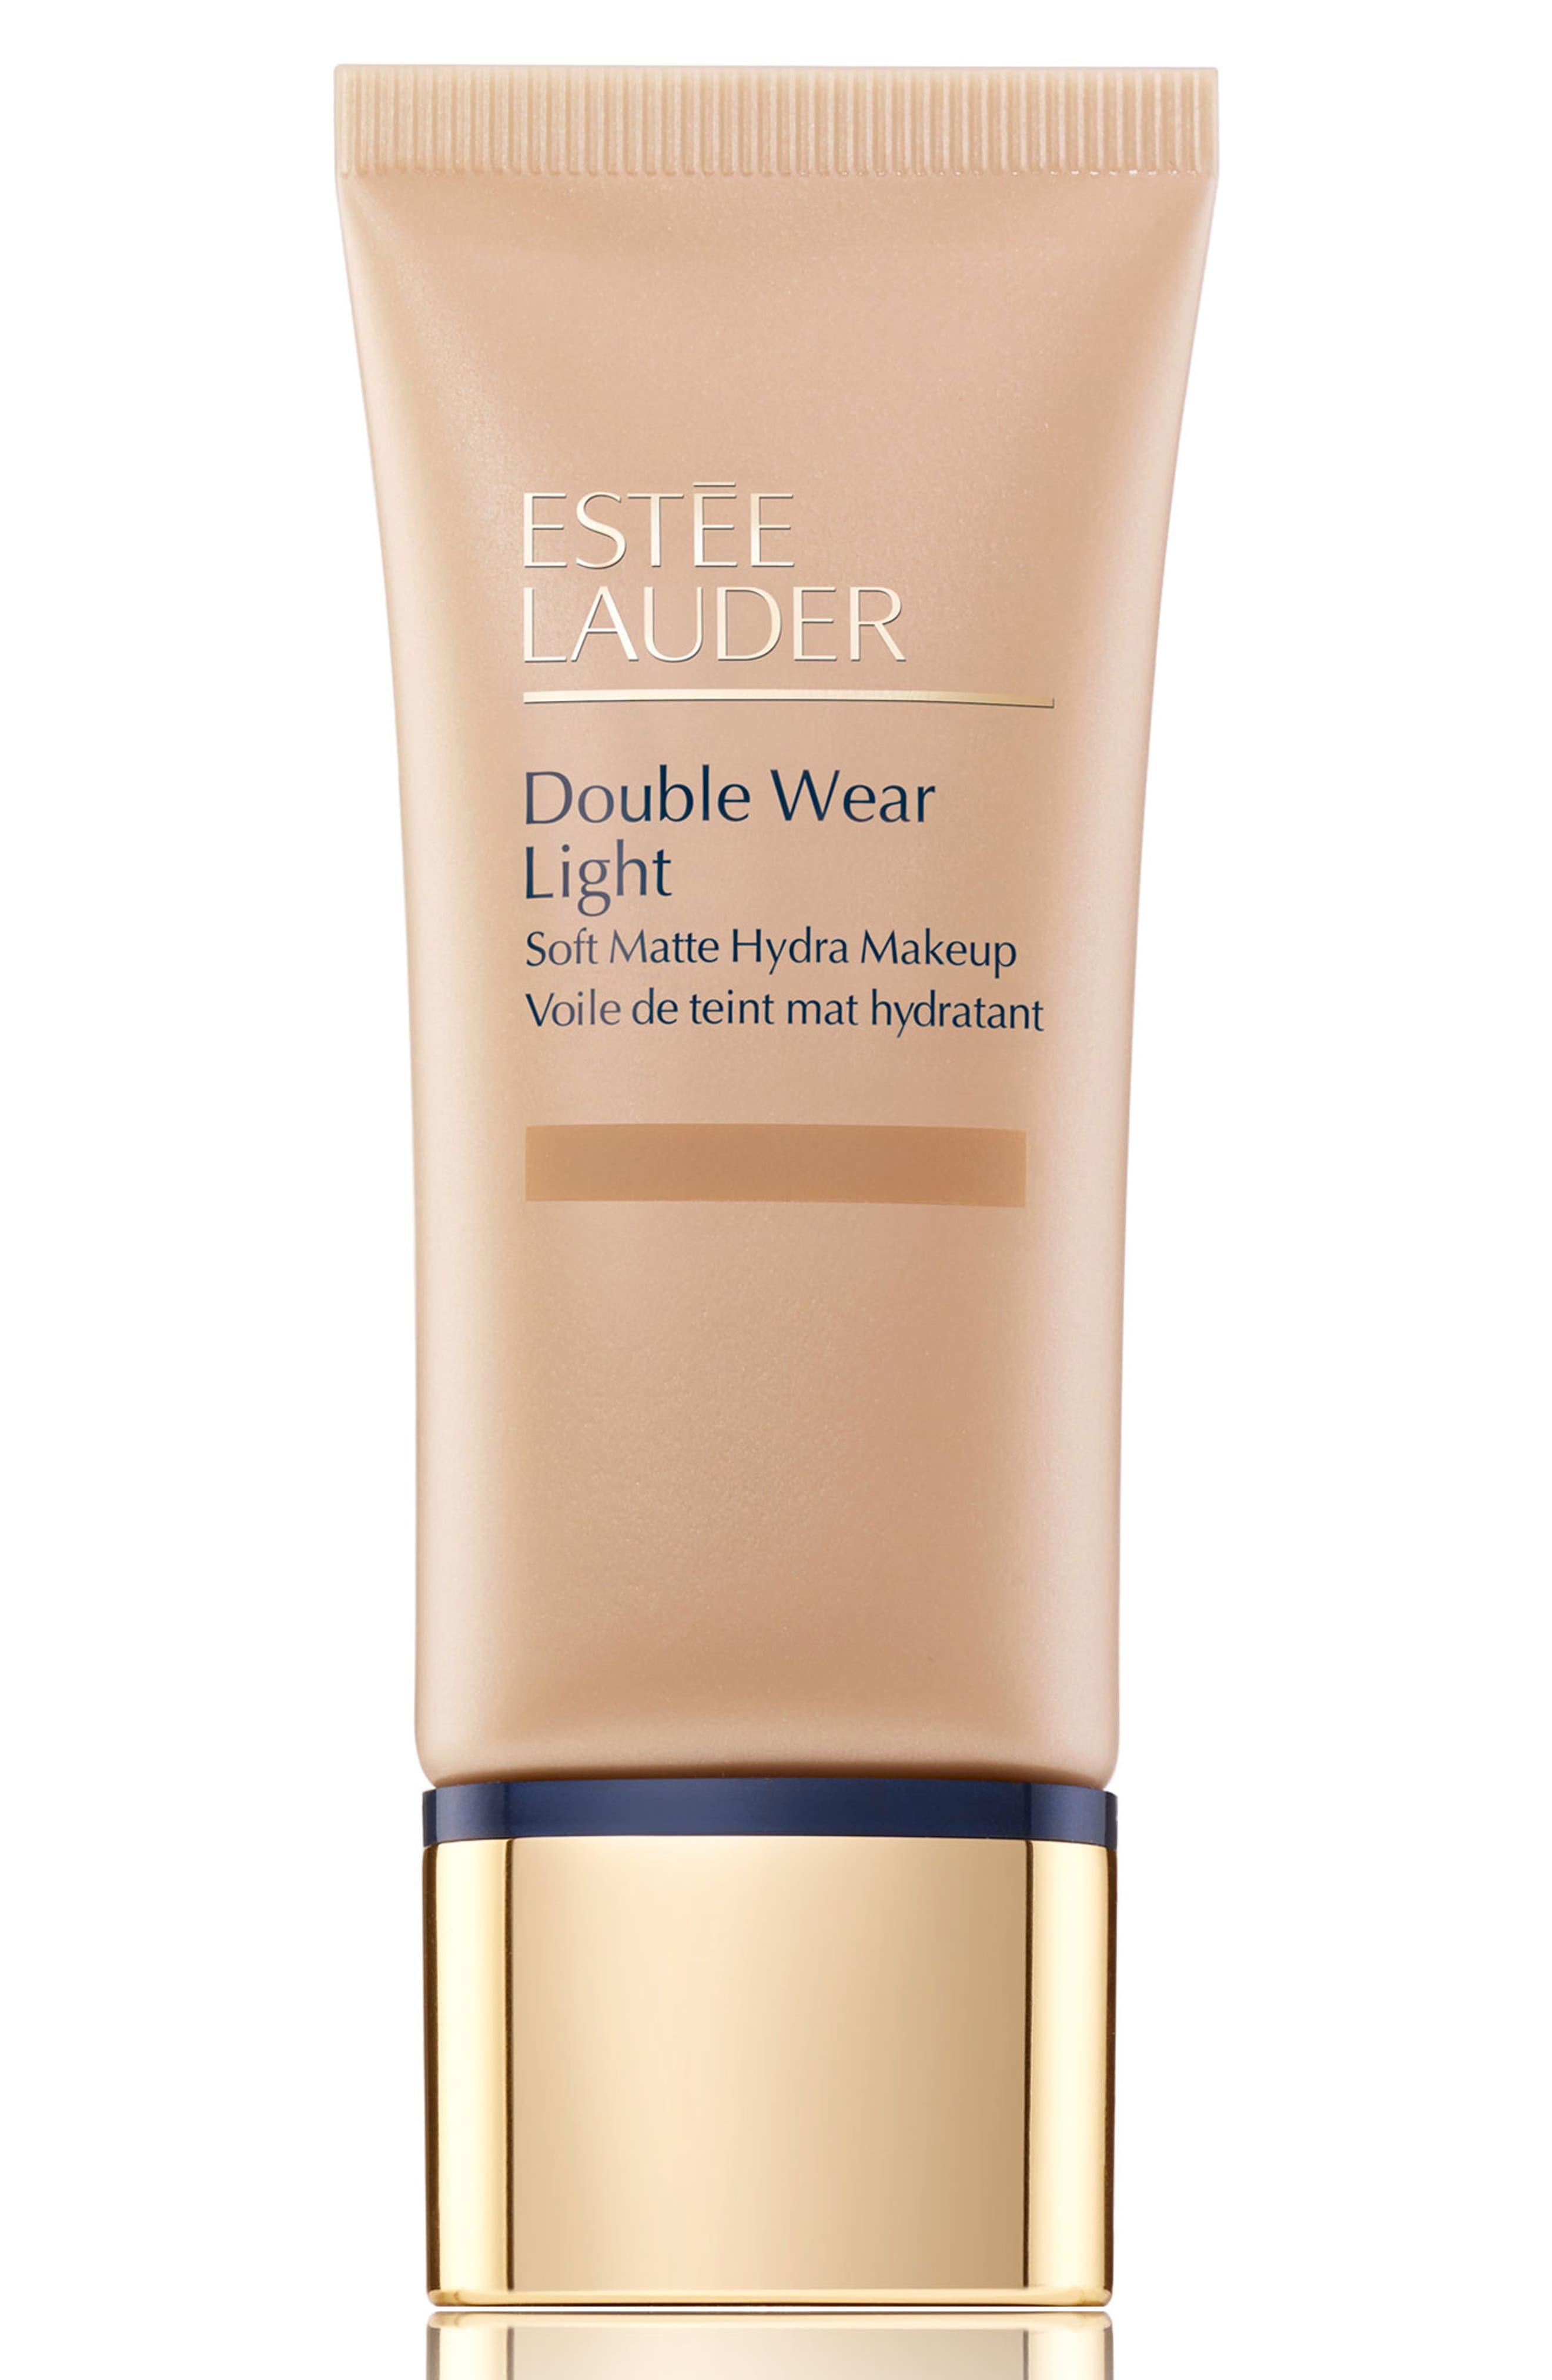 Estee Lauder Double Wear Light Soft Matte Hydra Makeup - 3W1 Tawny